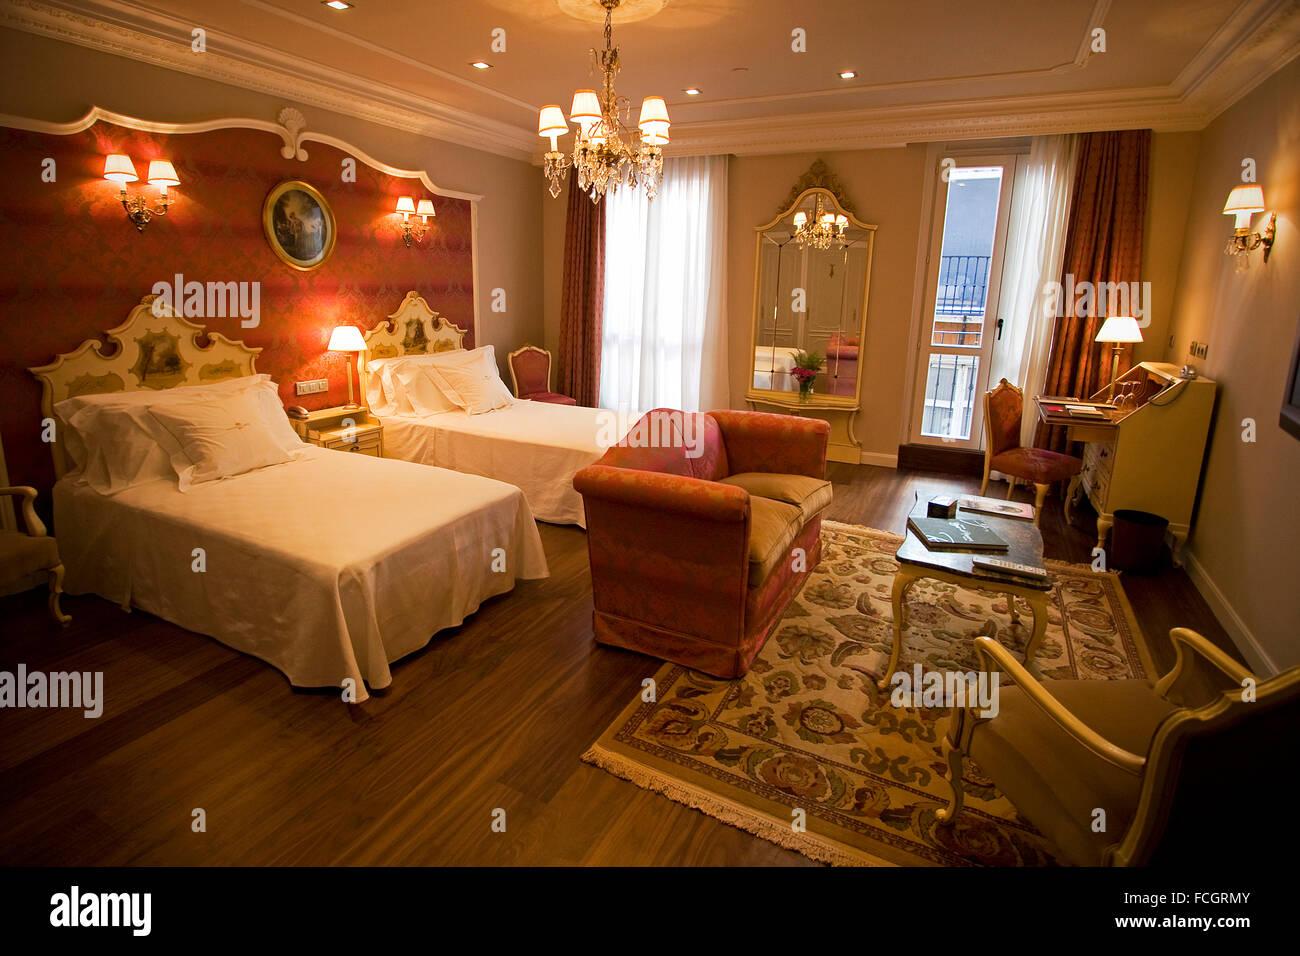 Ernest Hemingway Bedroom. Hotel La Perla. Pamplona. Navarre, Spain